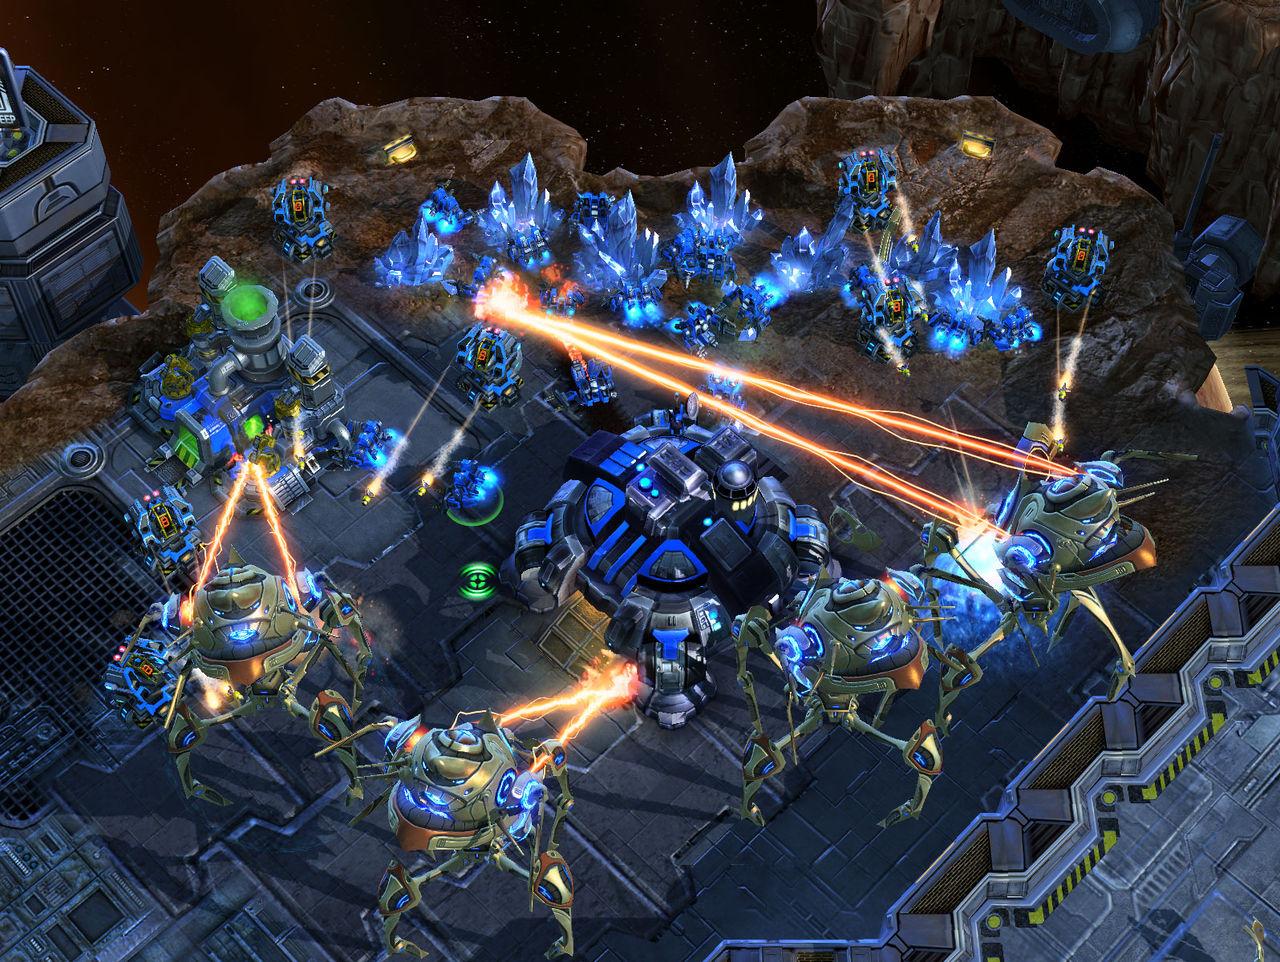 Nu ska Googles DeepMind börja spela StarCraft II